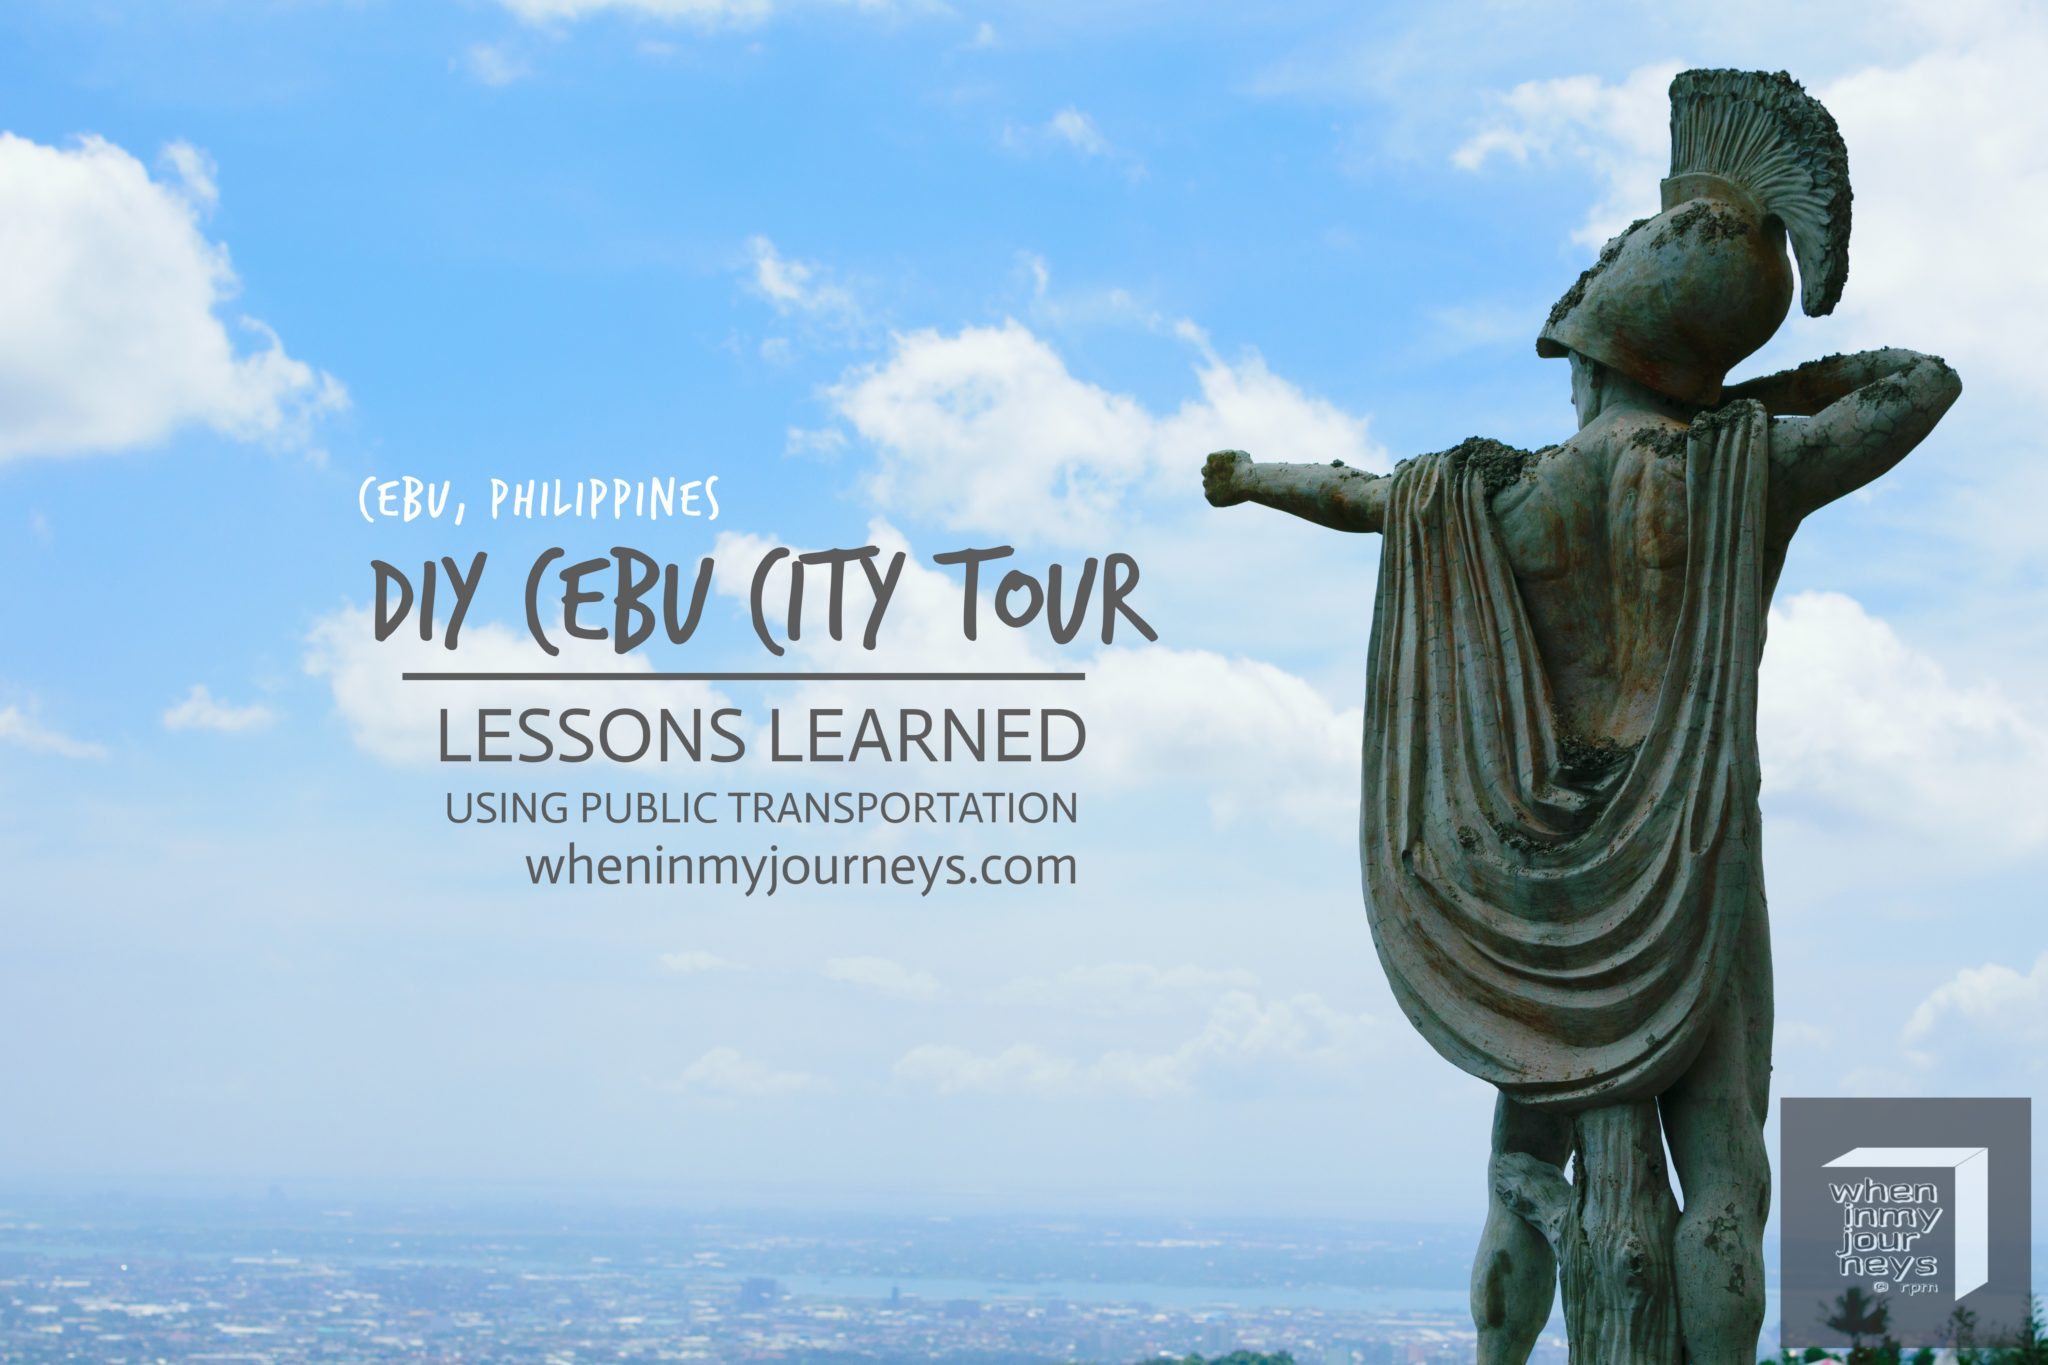 Cebu DIY Cebu City Tour - Part 1